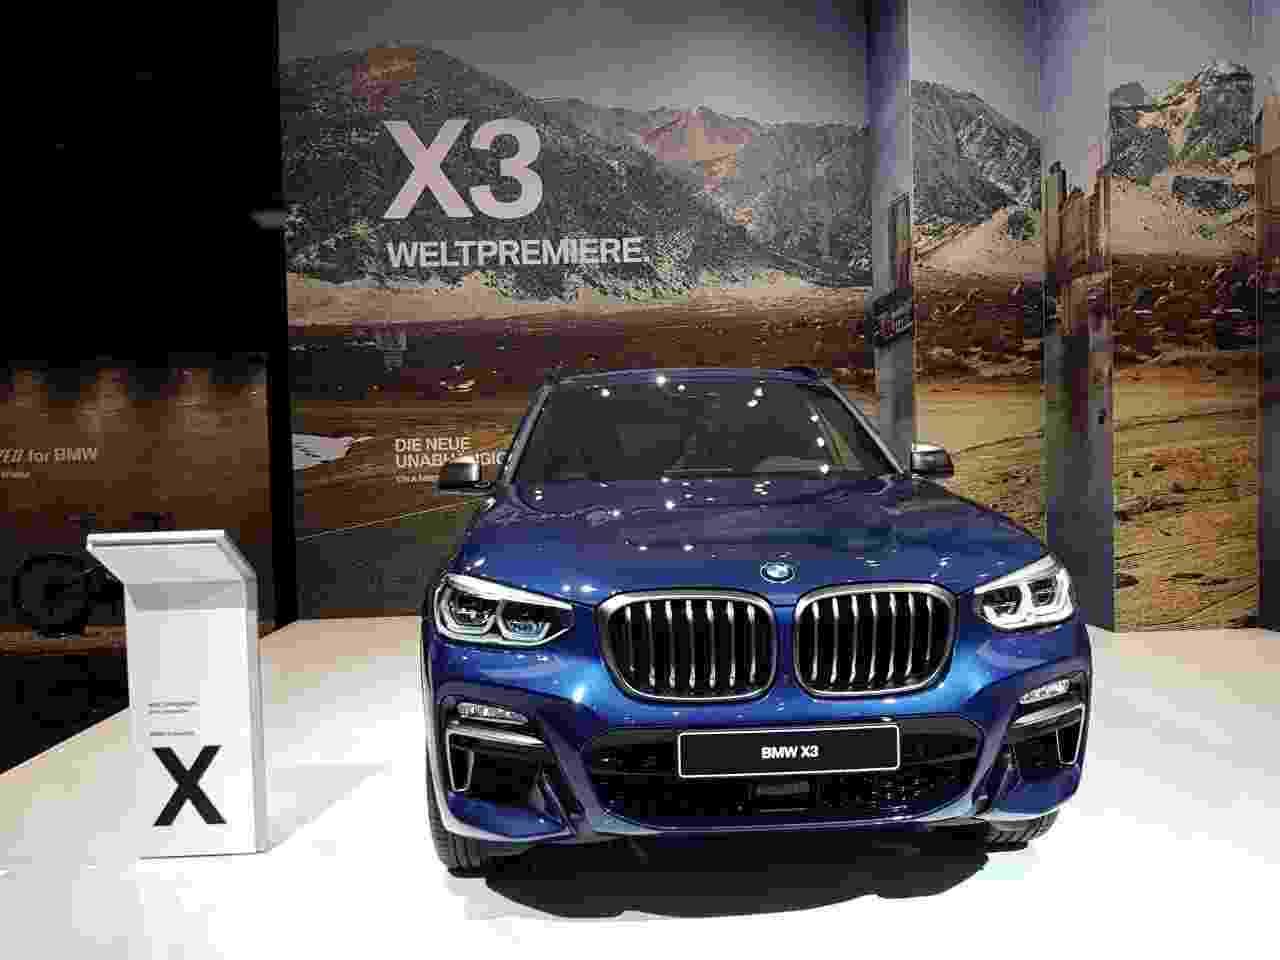 BMW X3 2018 - André Deliberato/UOL